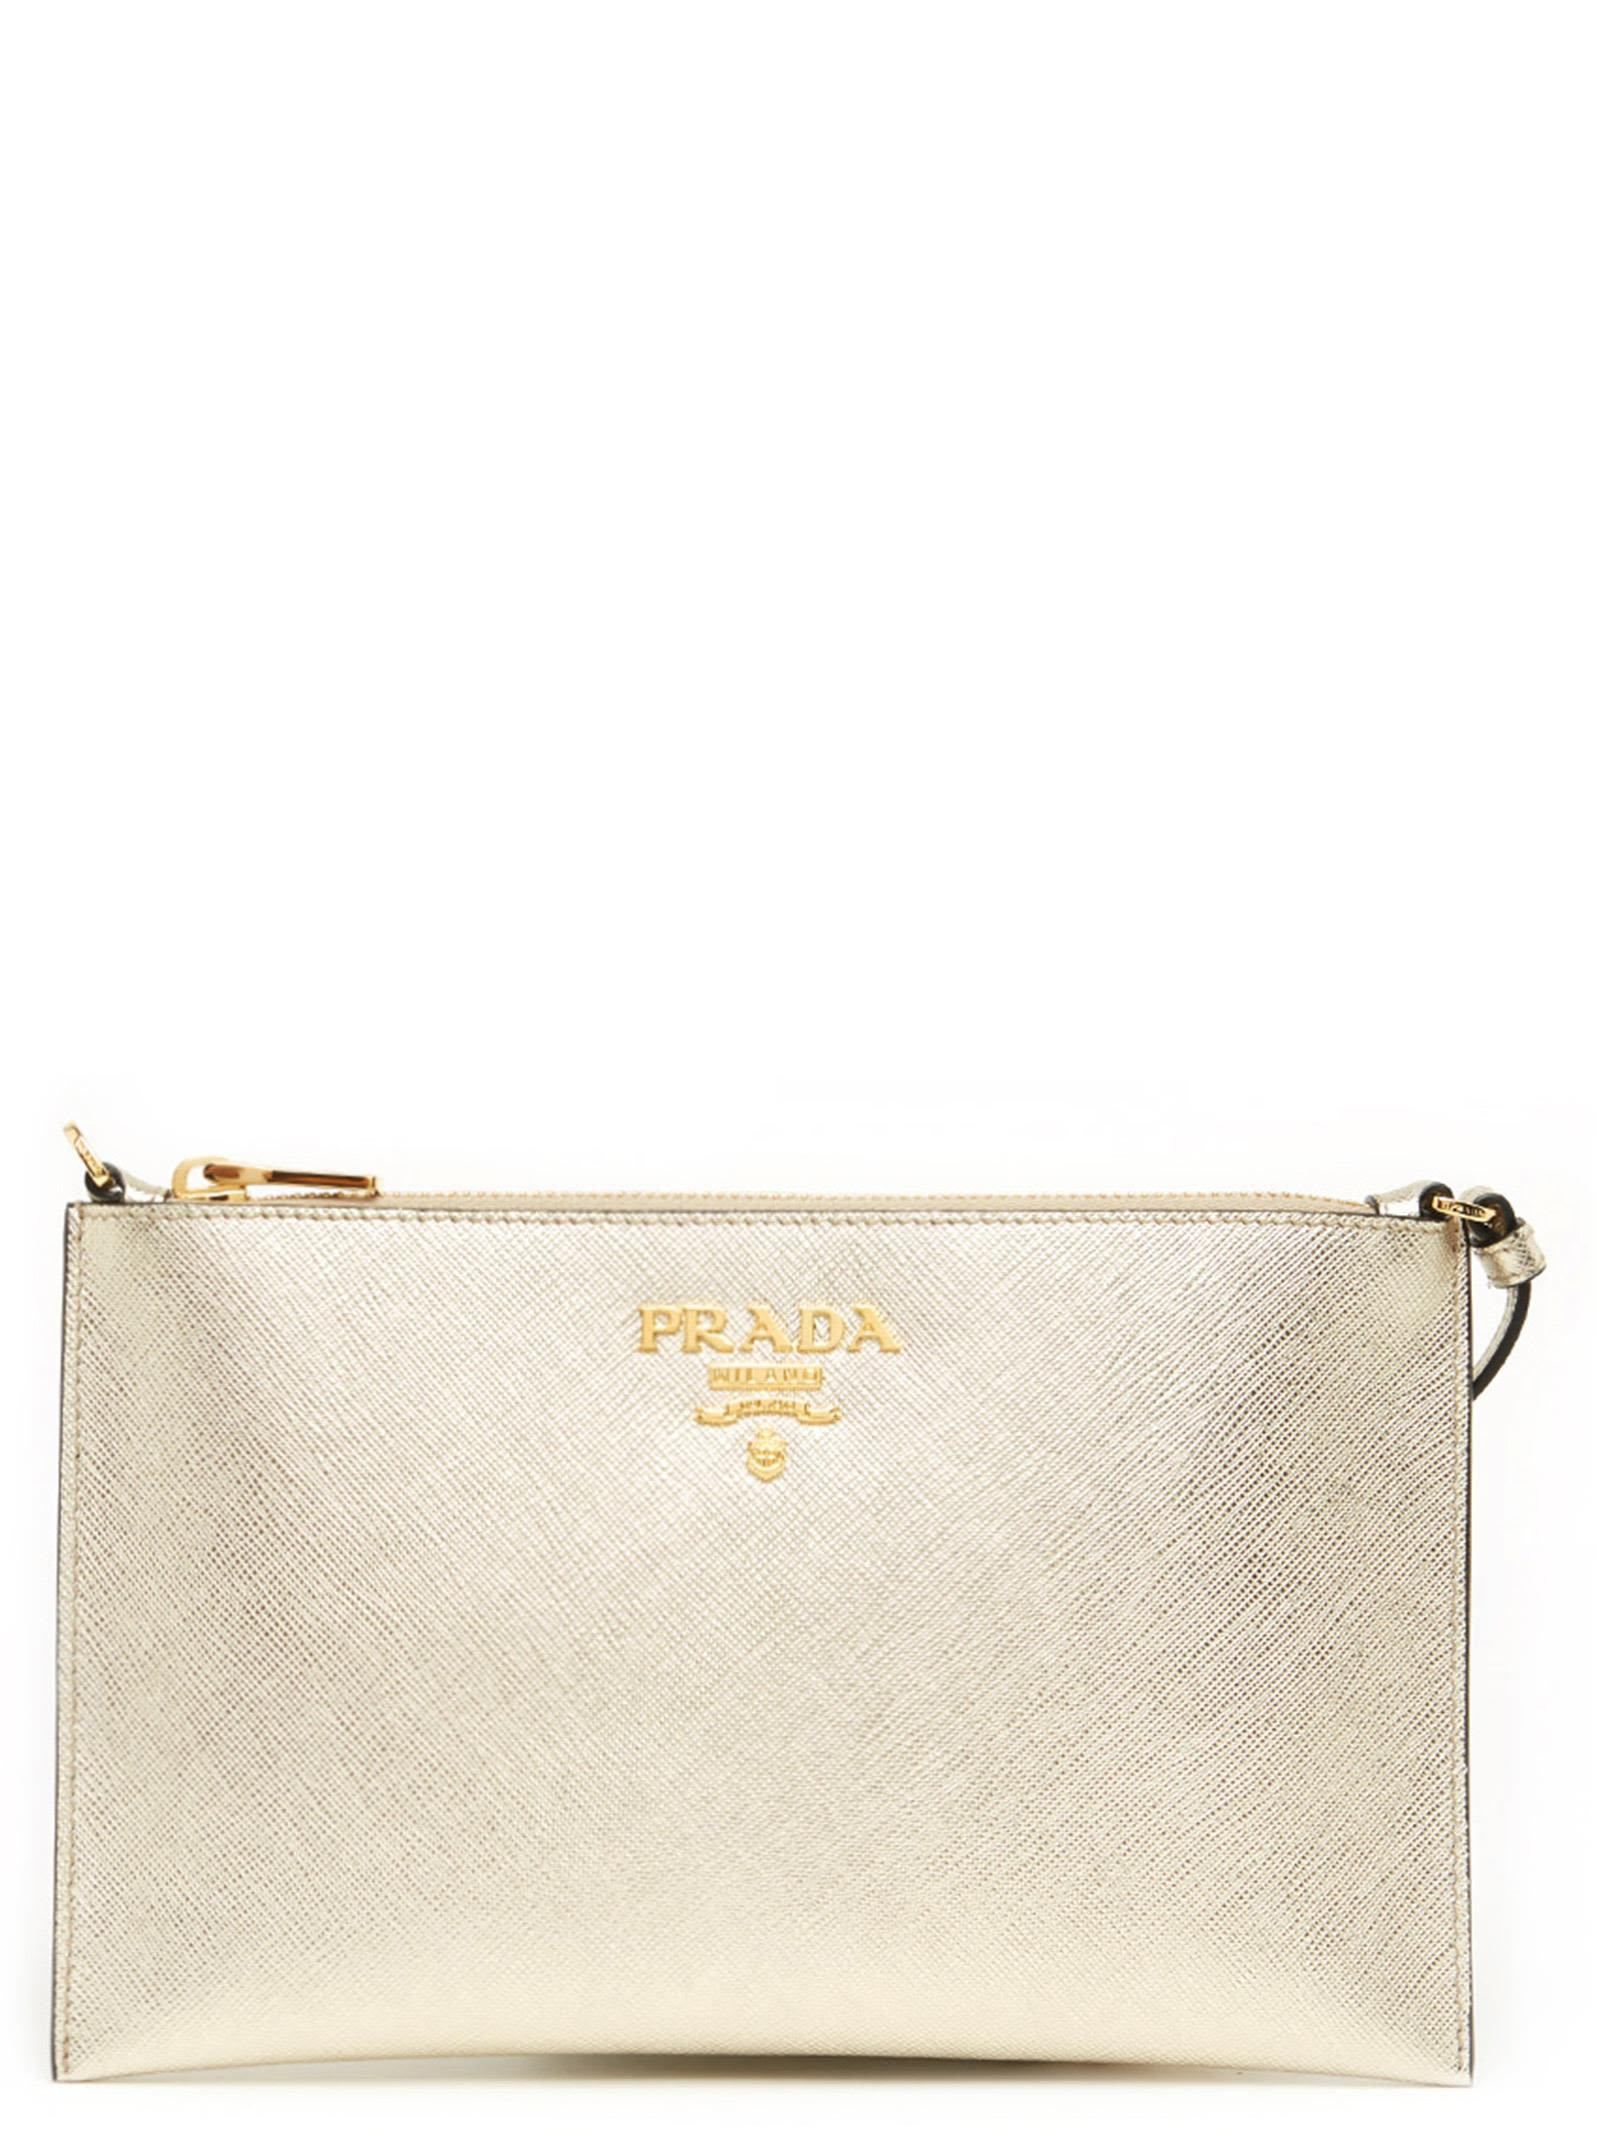 Piattina Bag, Gold